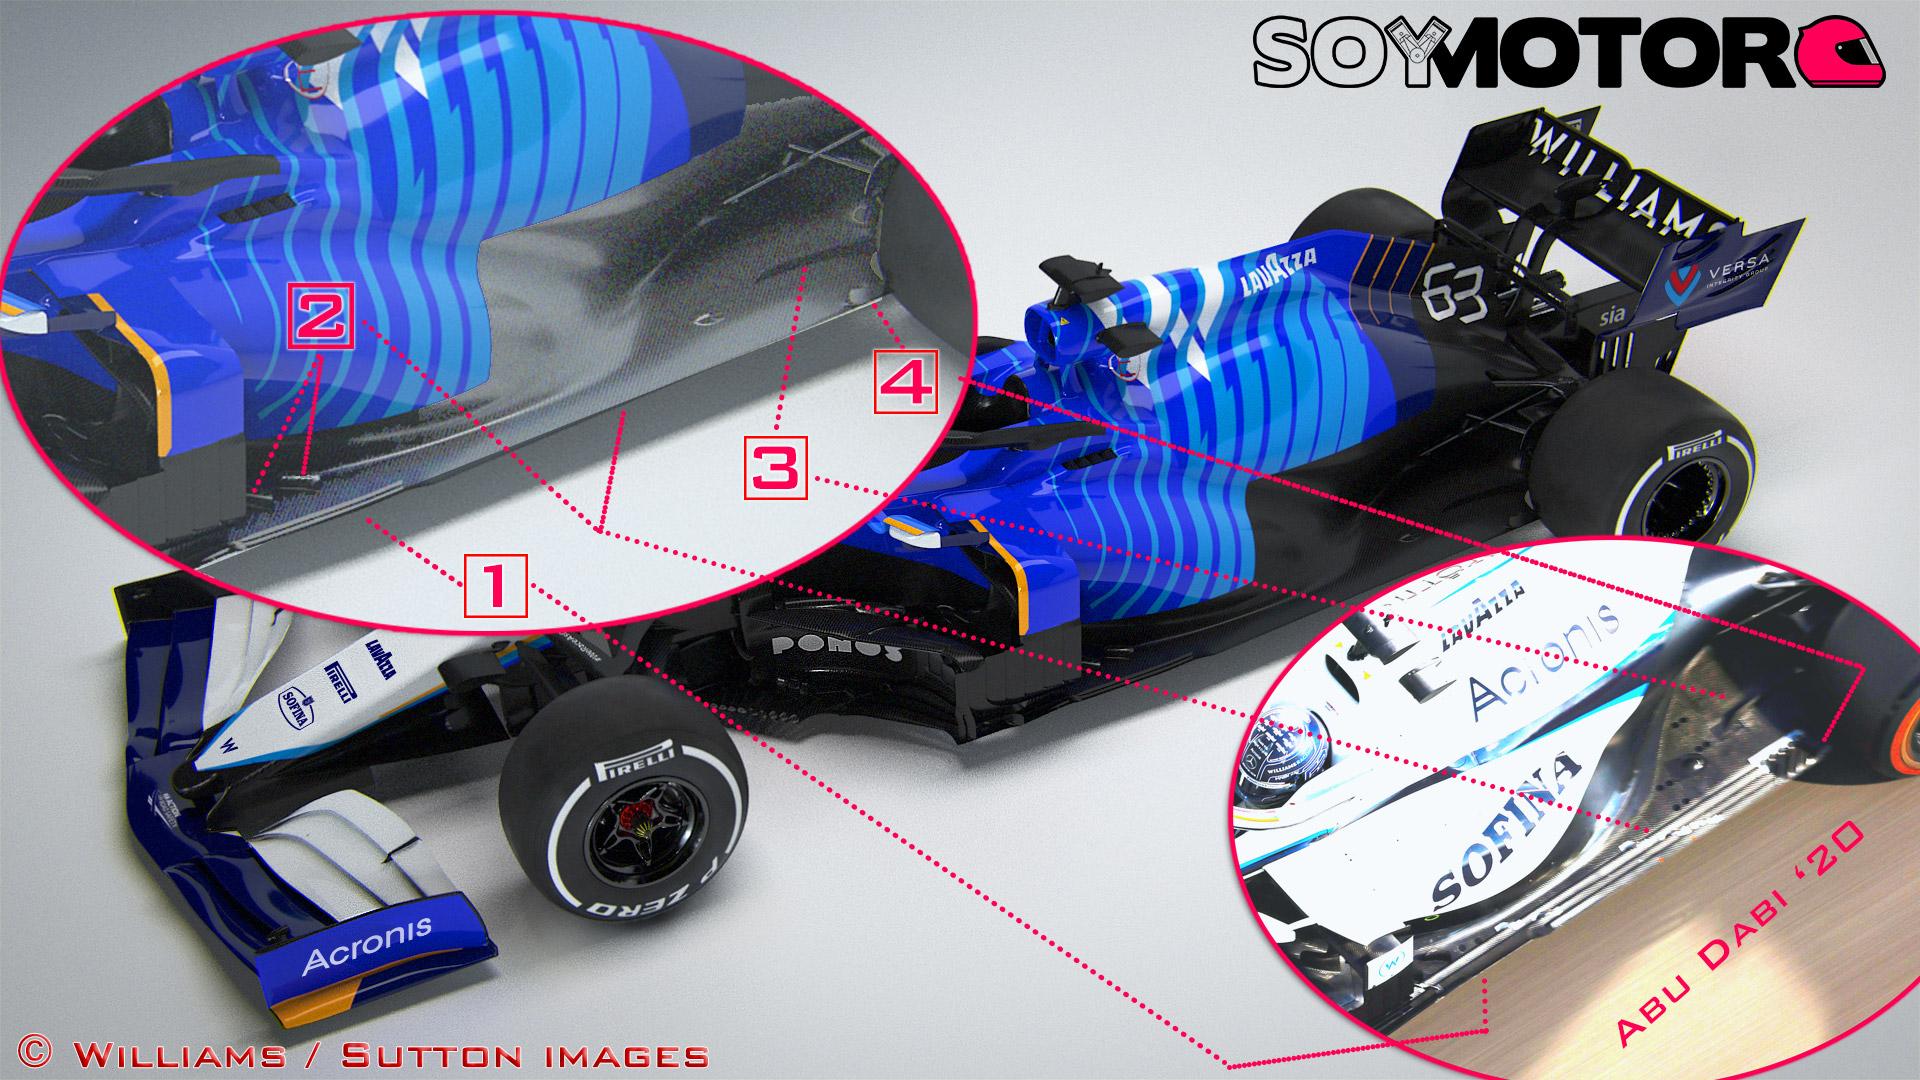 williams-fw43b-suelo-2-soymotor.jpg